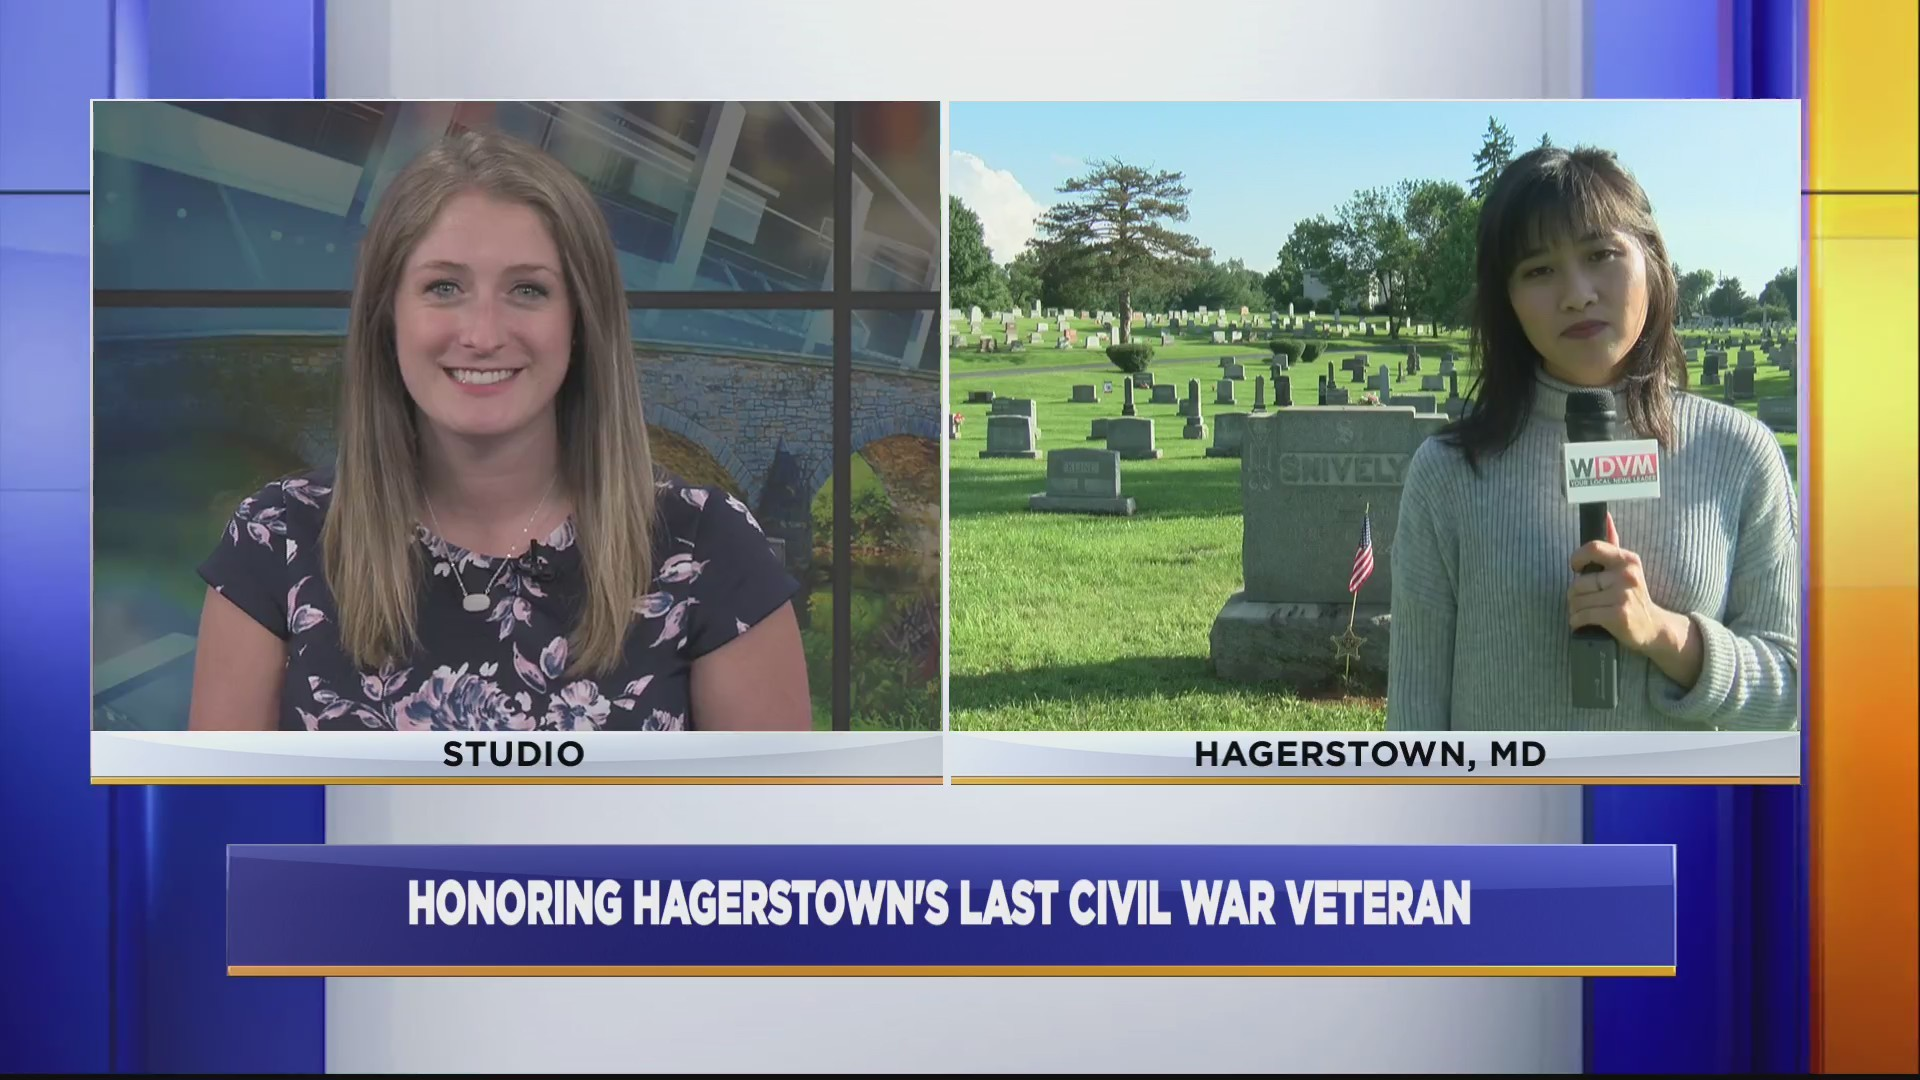 Civil_War_veteran_ceremony_0_20180624224144